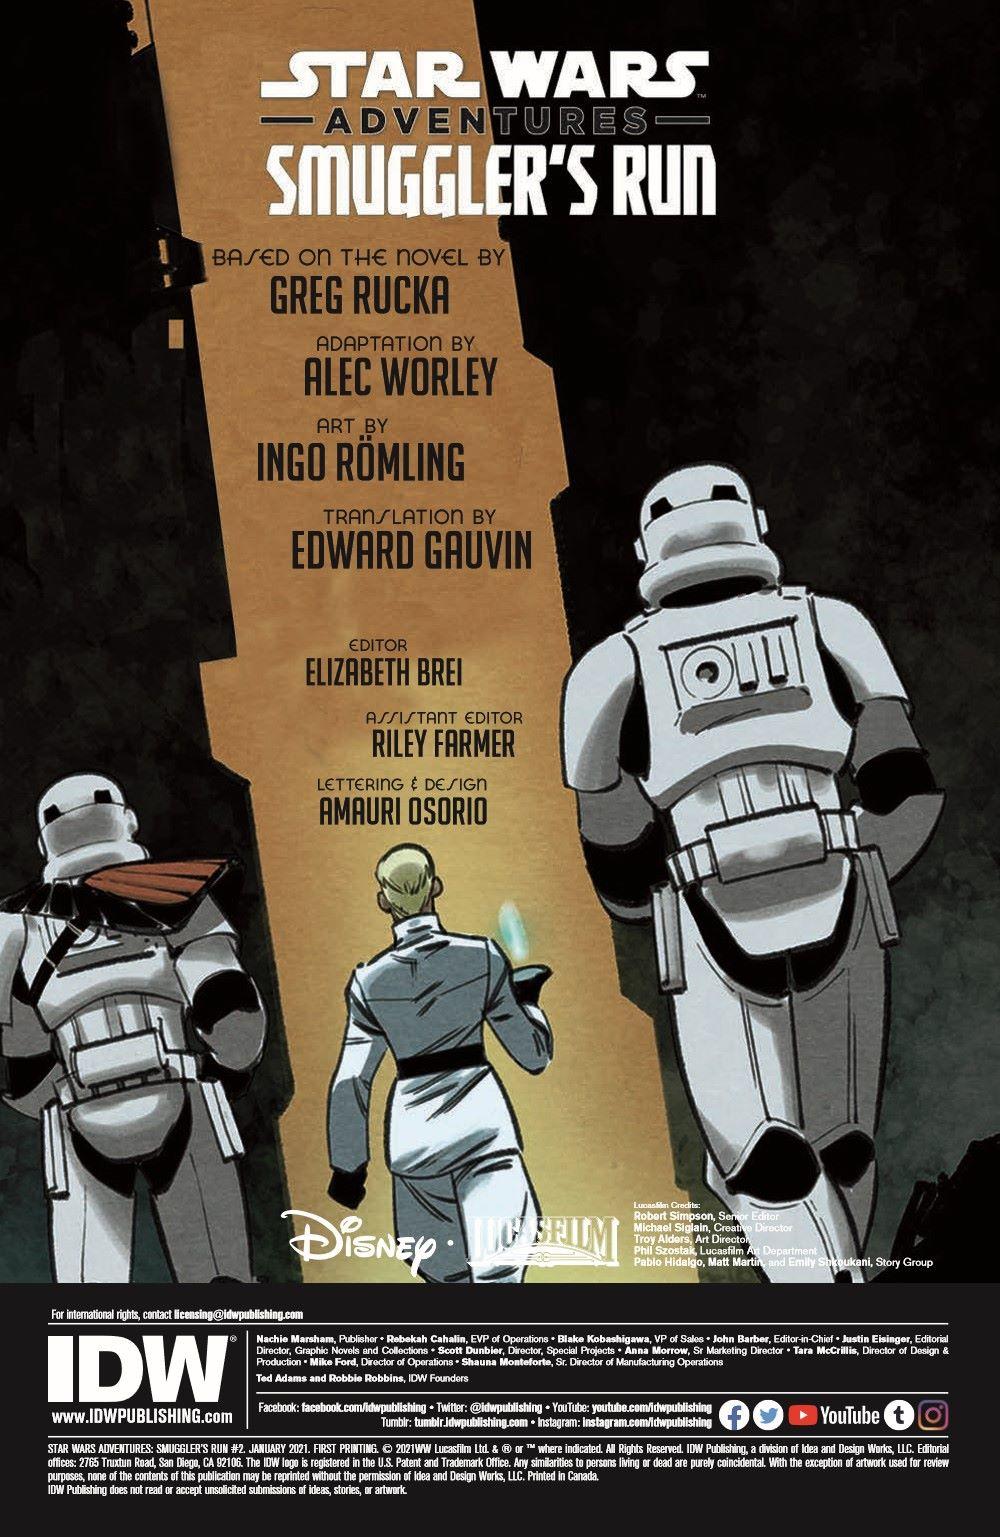 SWA_Smuggler02_pr-2 ComicList Previews: STAR WARS ADVENTURES SMUGGLER'S RUN #2 (OF 2)